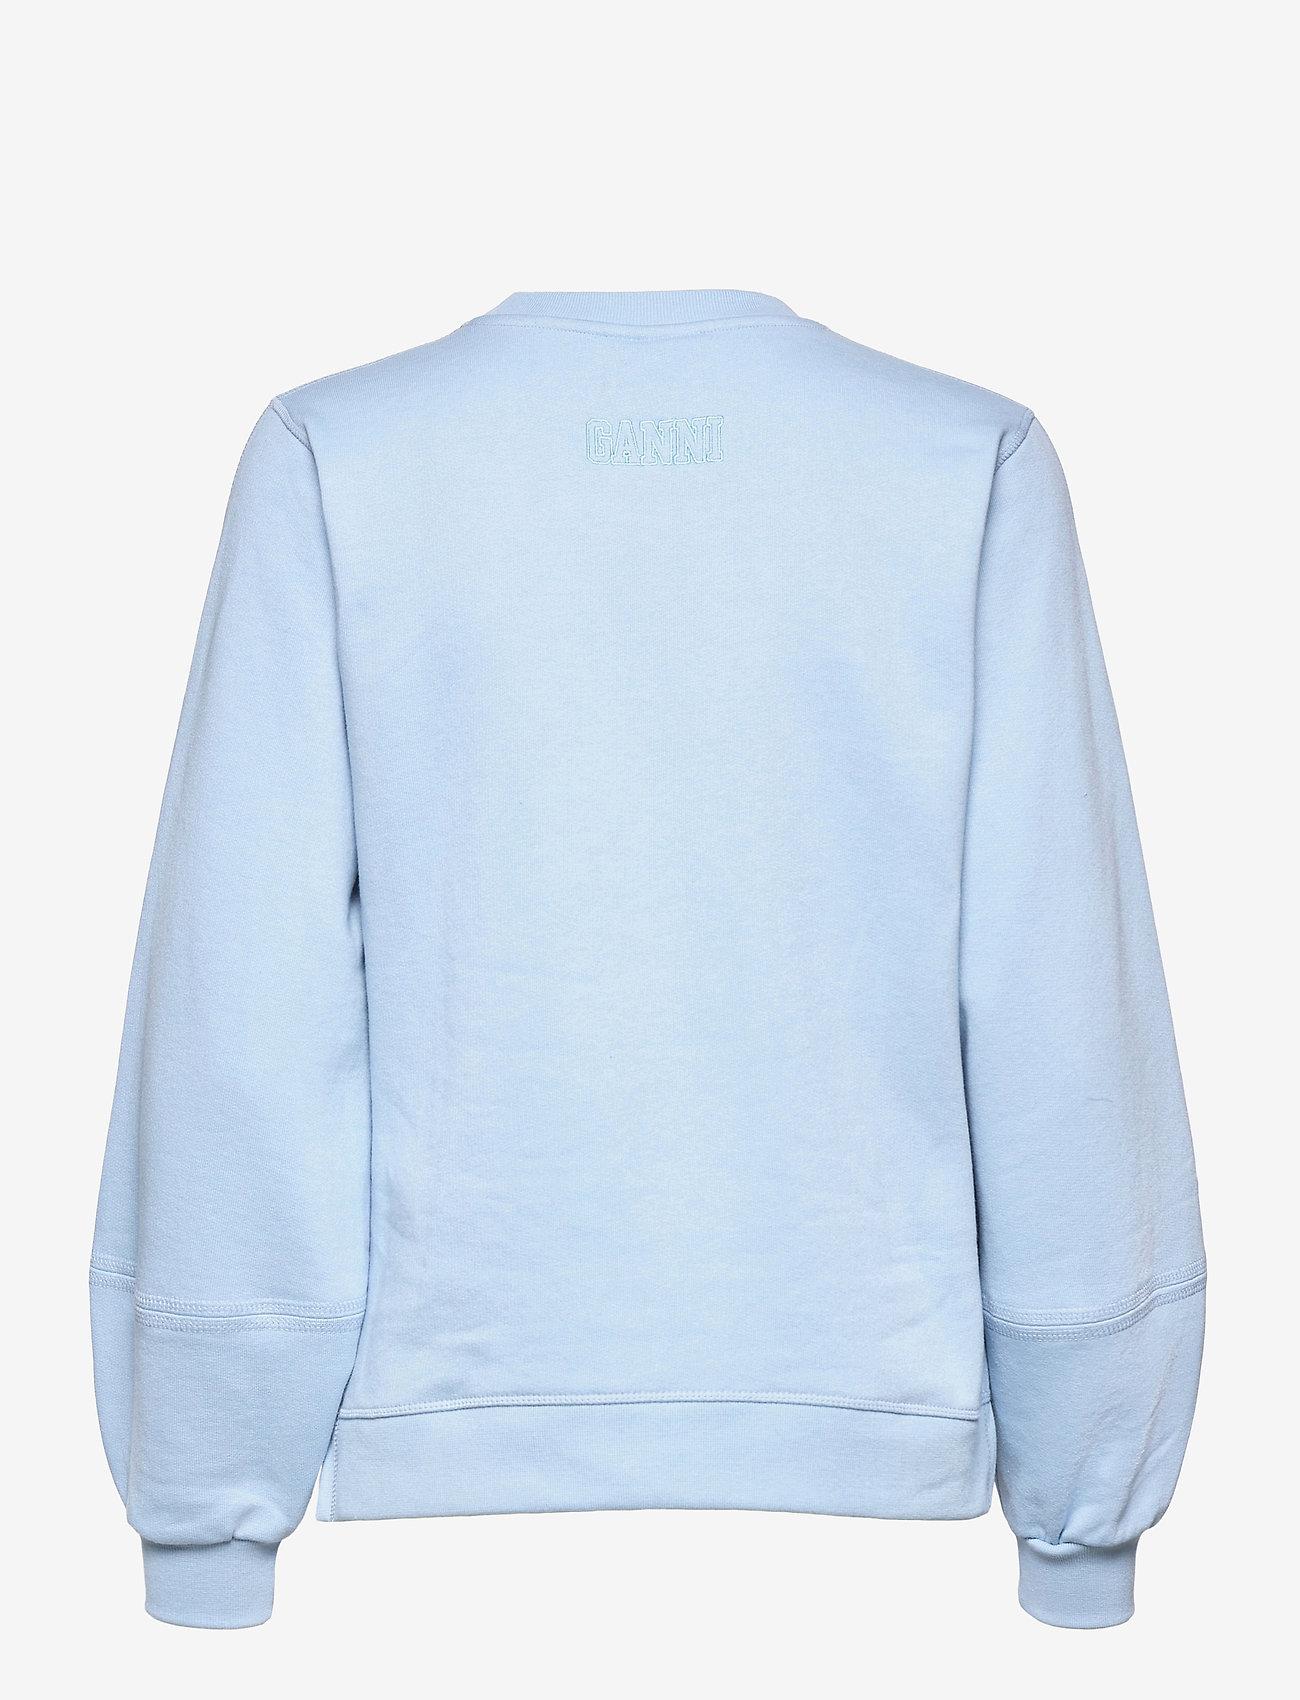 Ganni - Software Isoli - sweatshirts & hoodies - heather - 1